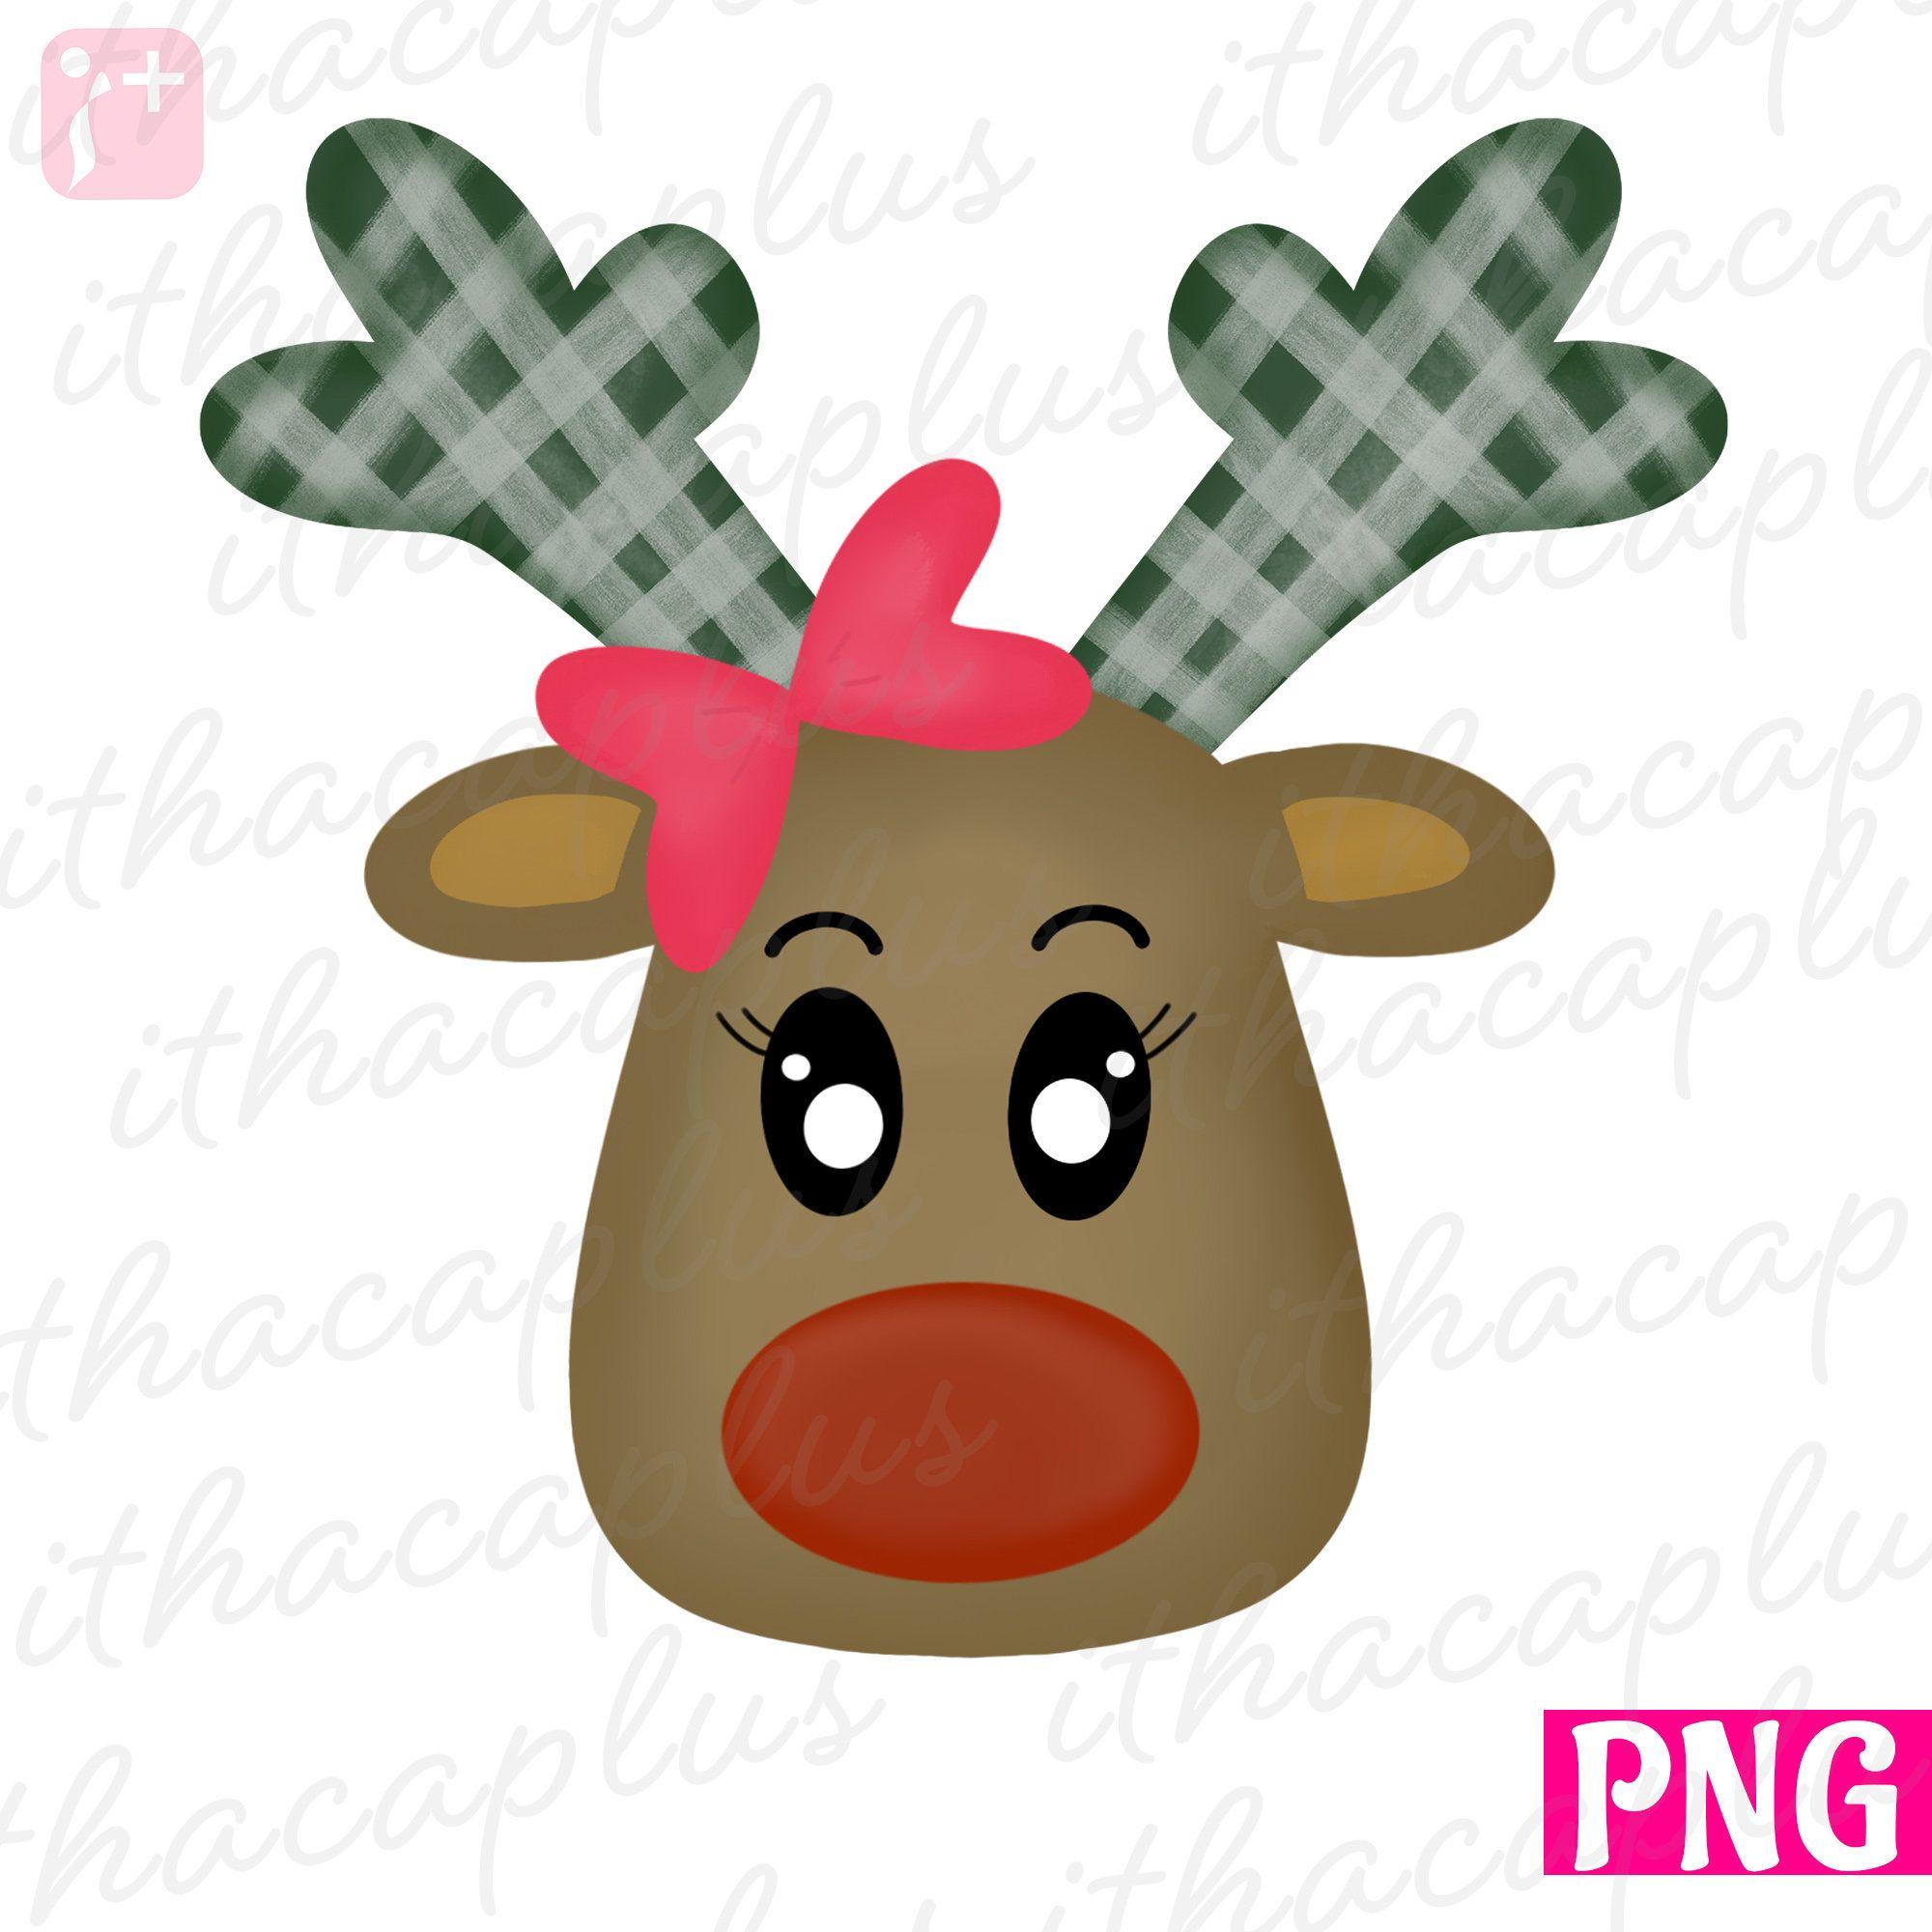 Reindeer Rudolph Png For Sublimation Christmas Reindeer Etsy Clip Art Printable Artwork Christmas Reindeer